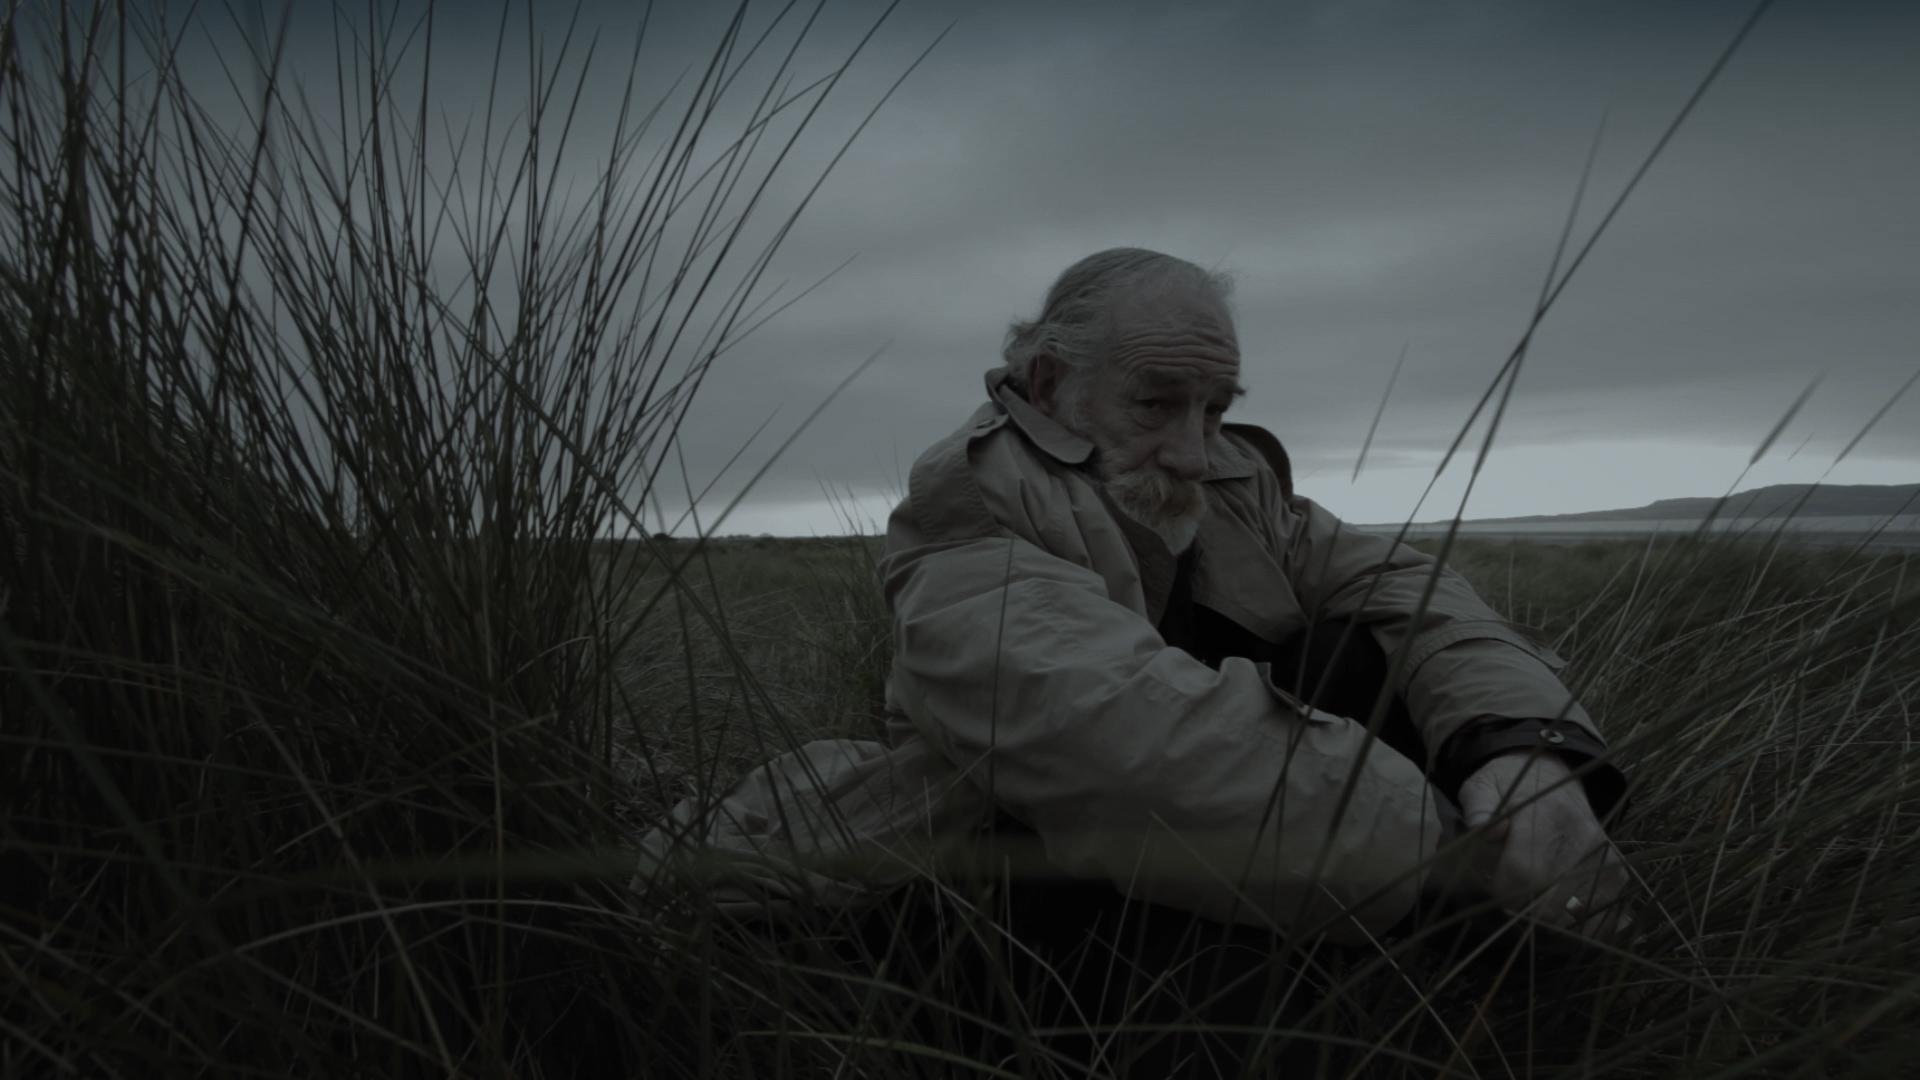 Banshee Blacktop-An Irish Ghost Story (In Search of Deirdre)